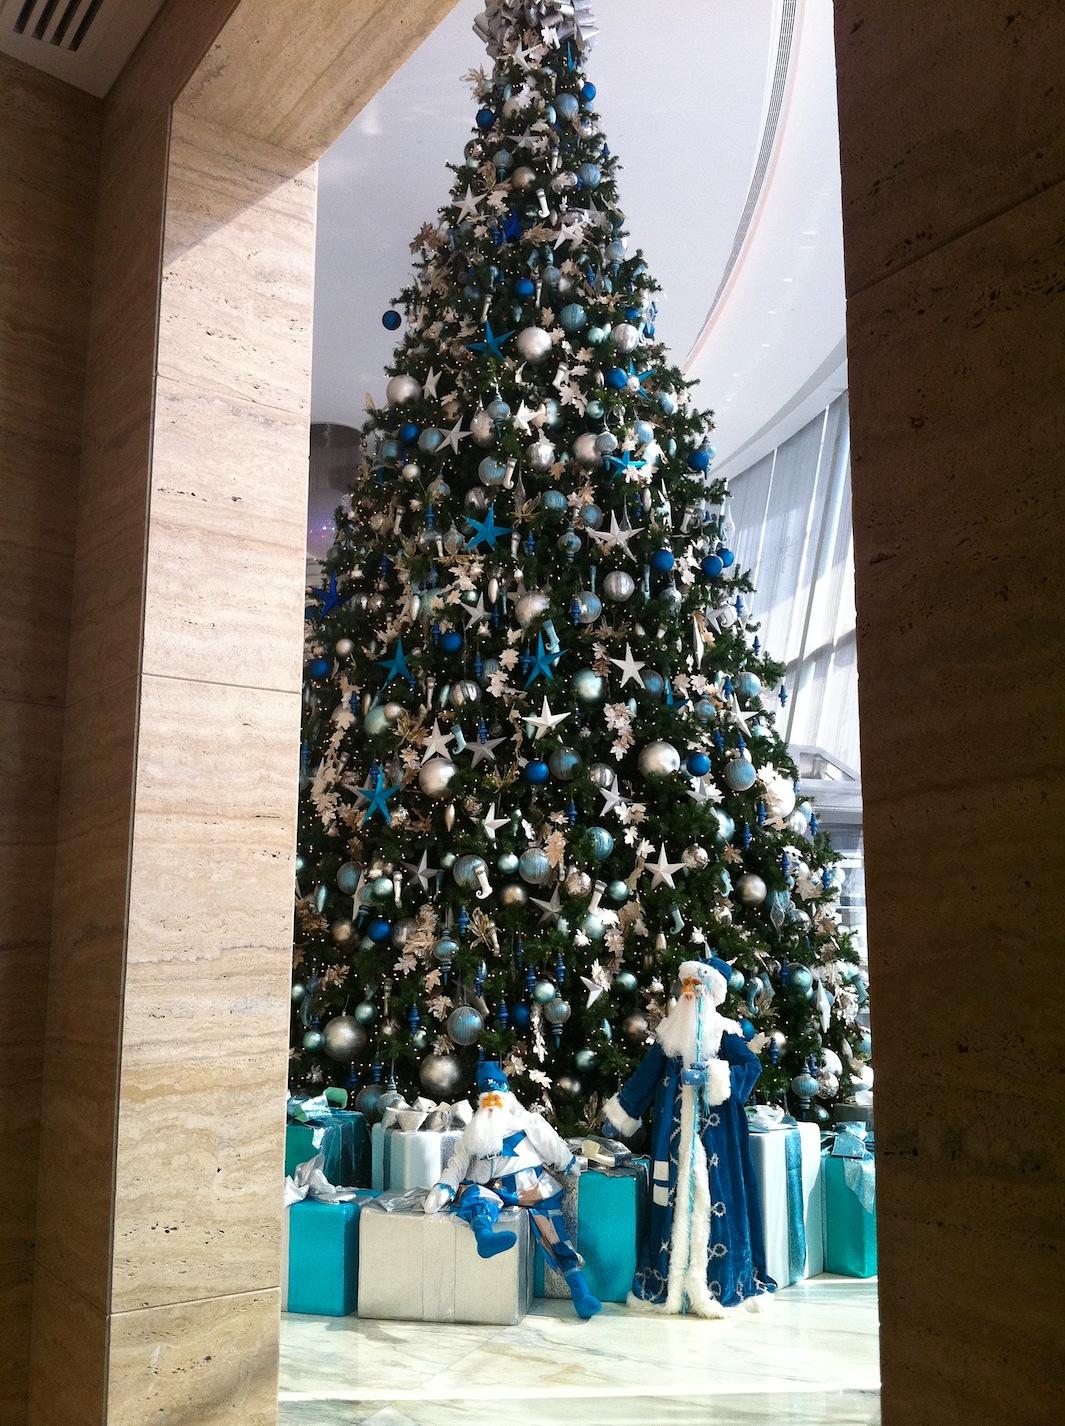 Hanukkah tree ornaments - Even